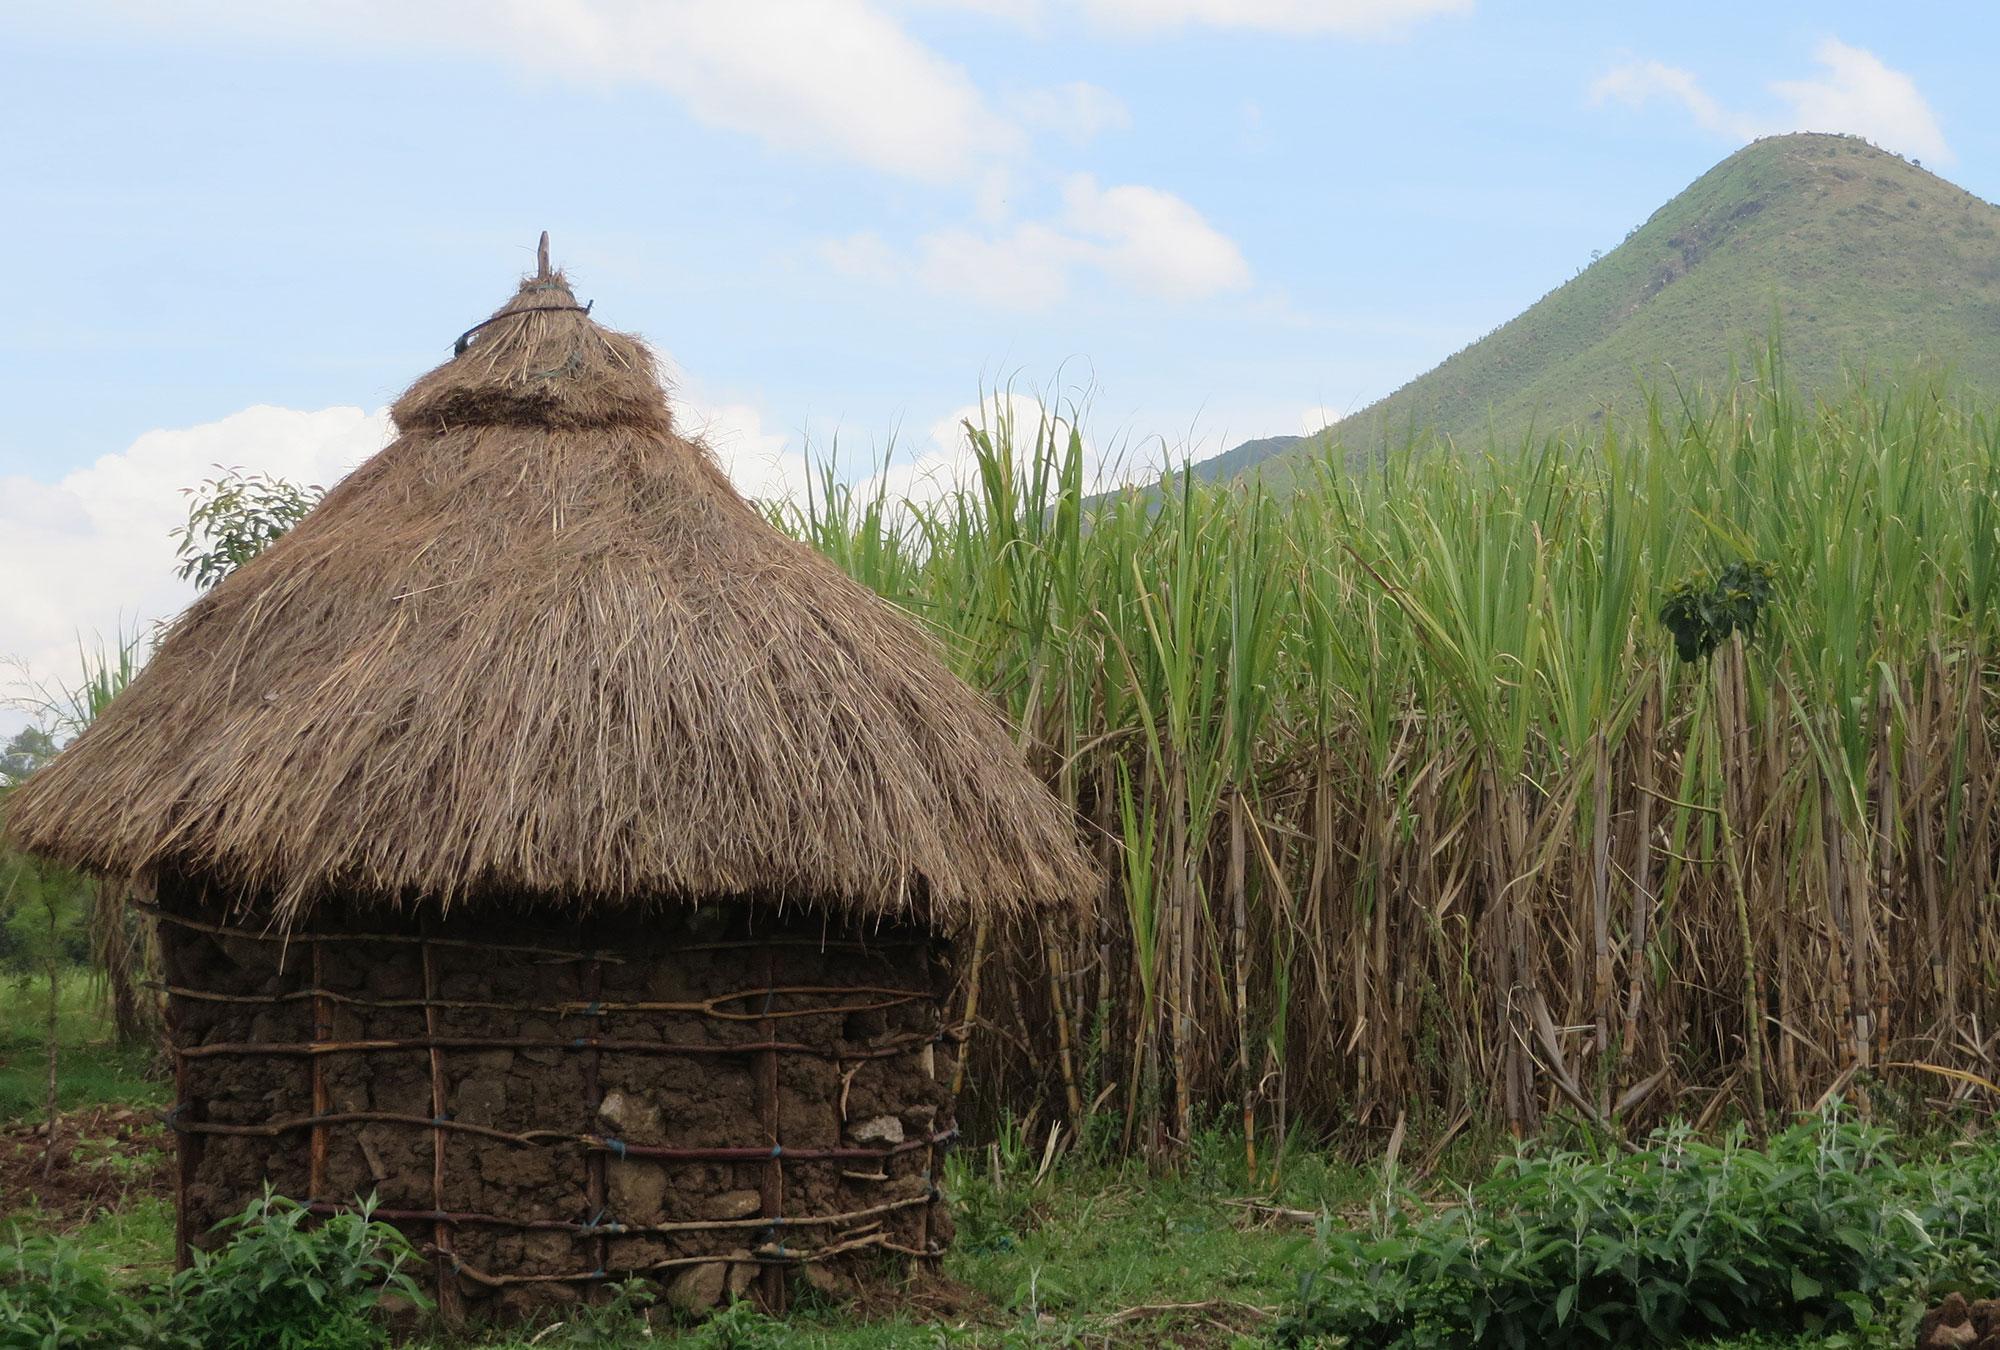 Hut next to a field of sugarcane in western Kenya.